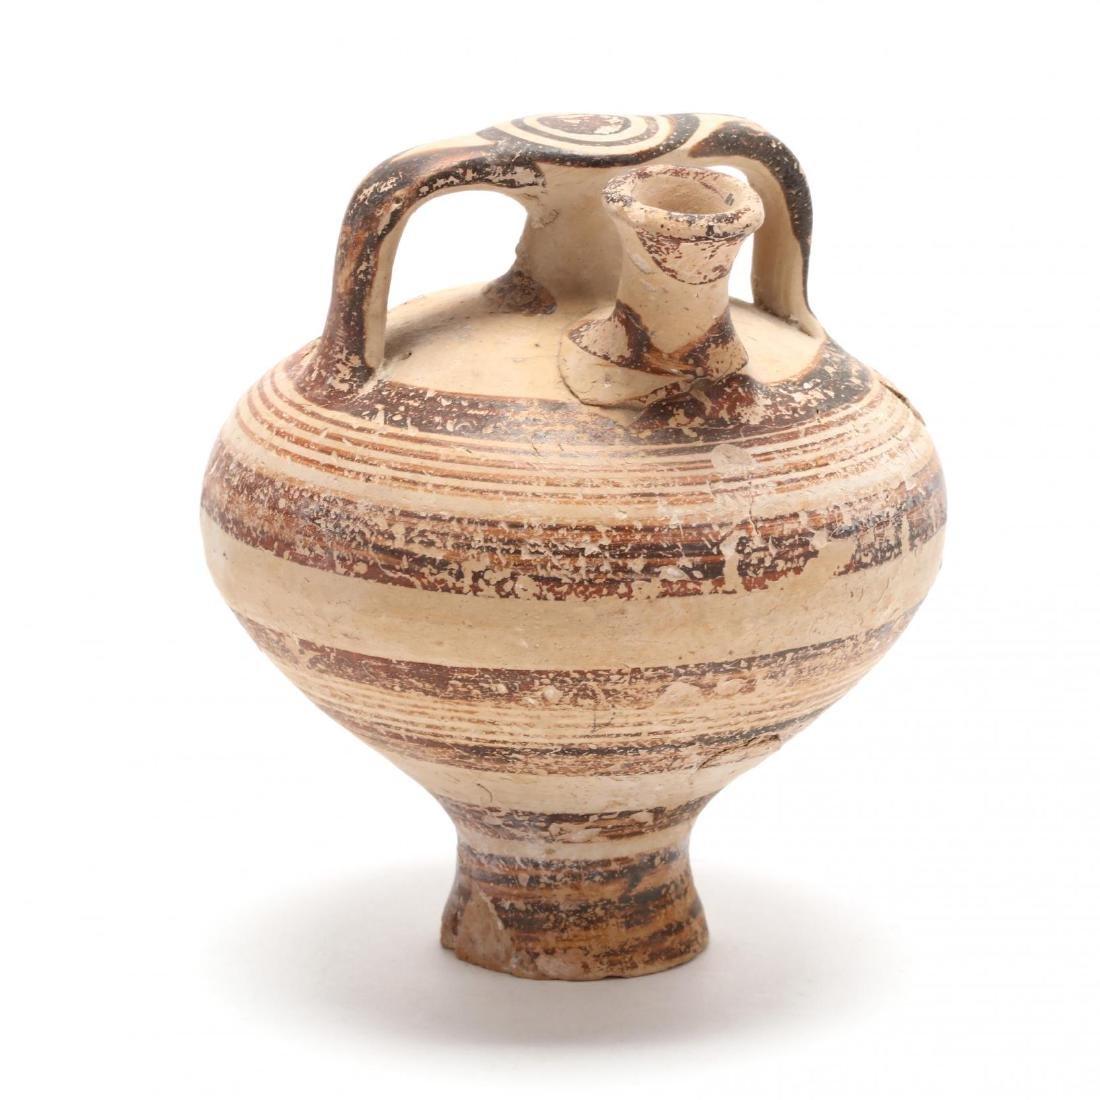 Cypro-Mycenaean Pottery Stirrup Jar